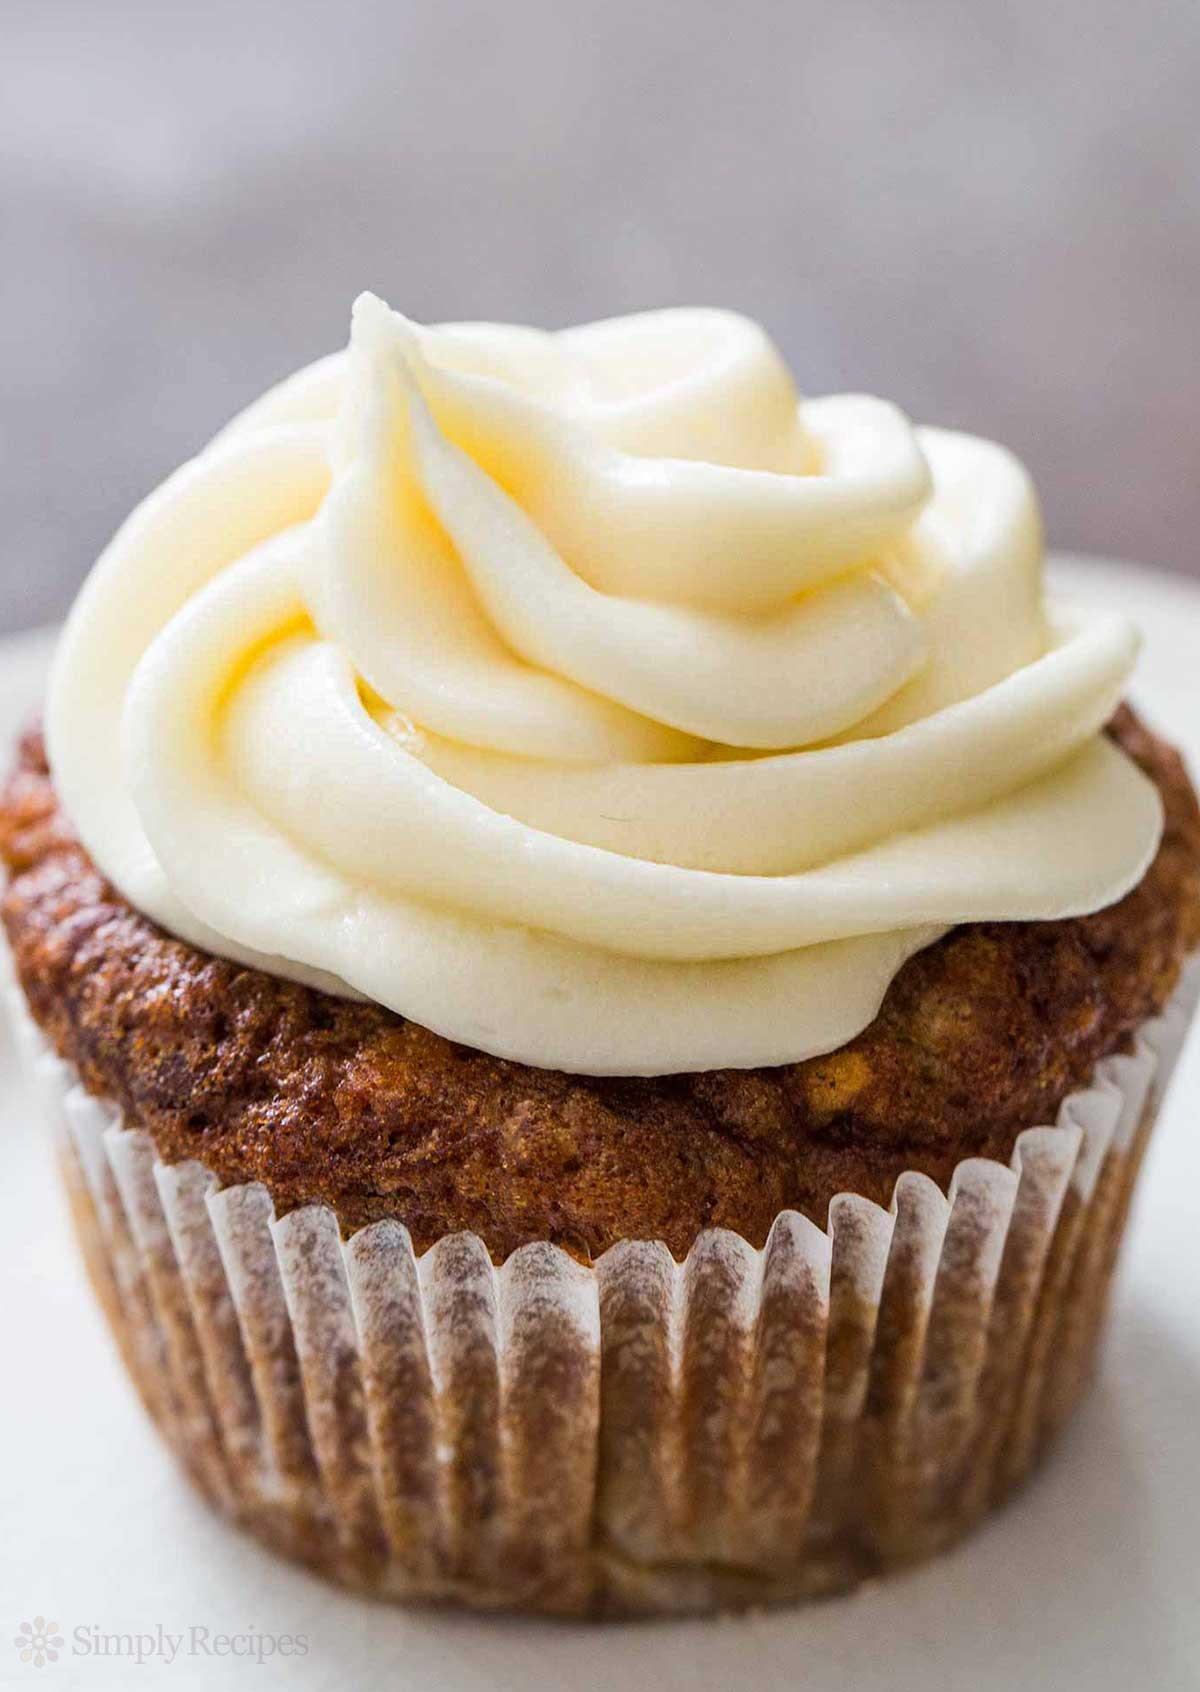 Cake Frosting Recipe  Cream Cheese Frosting Recipe